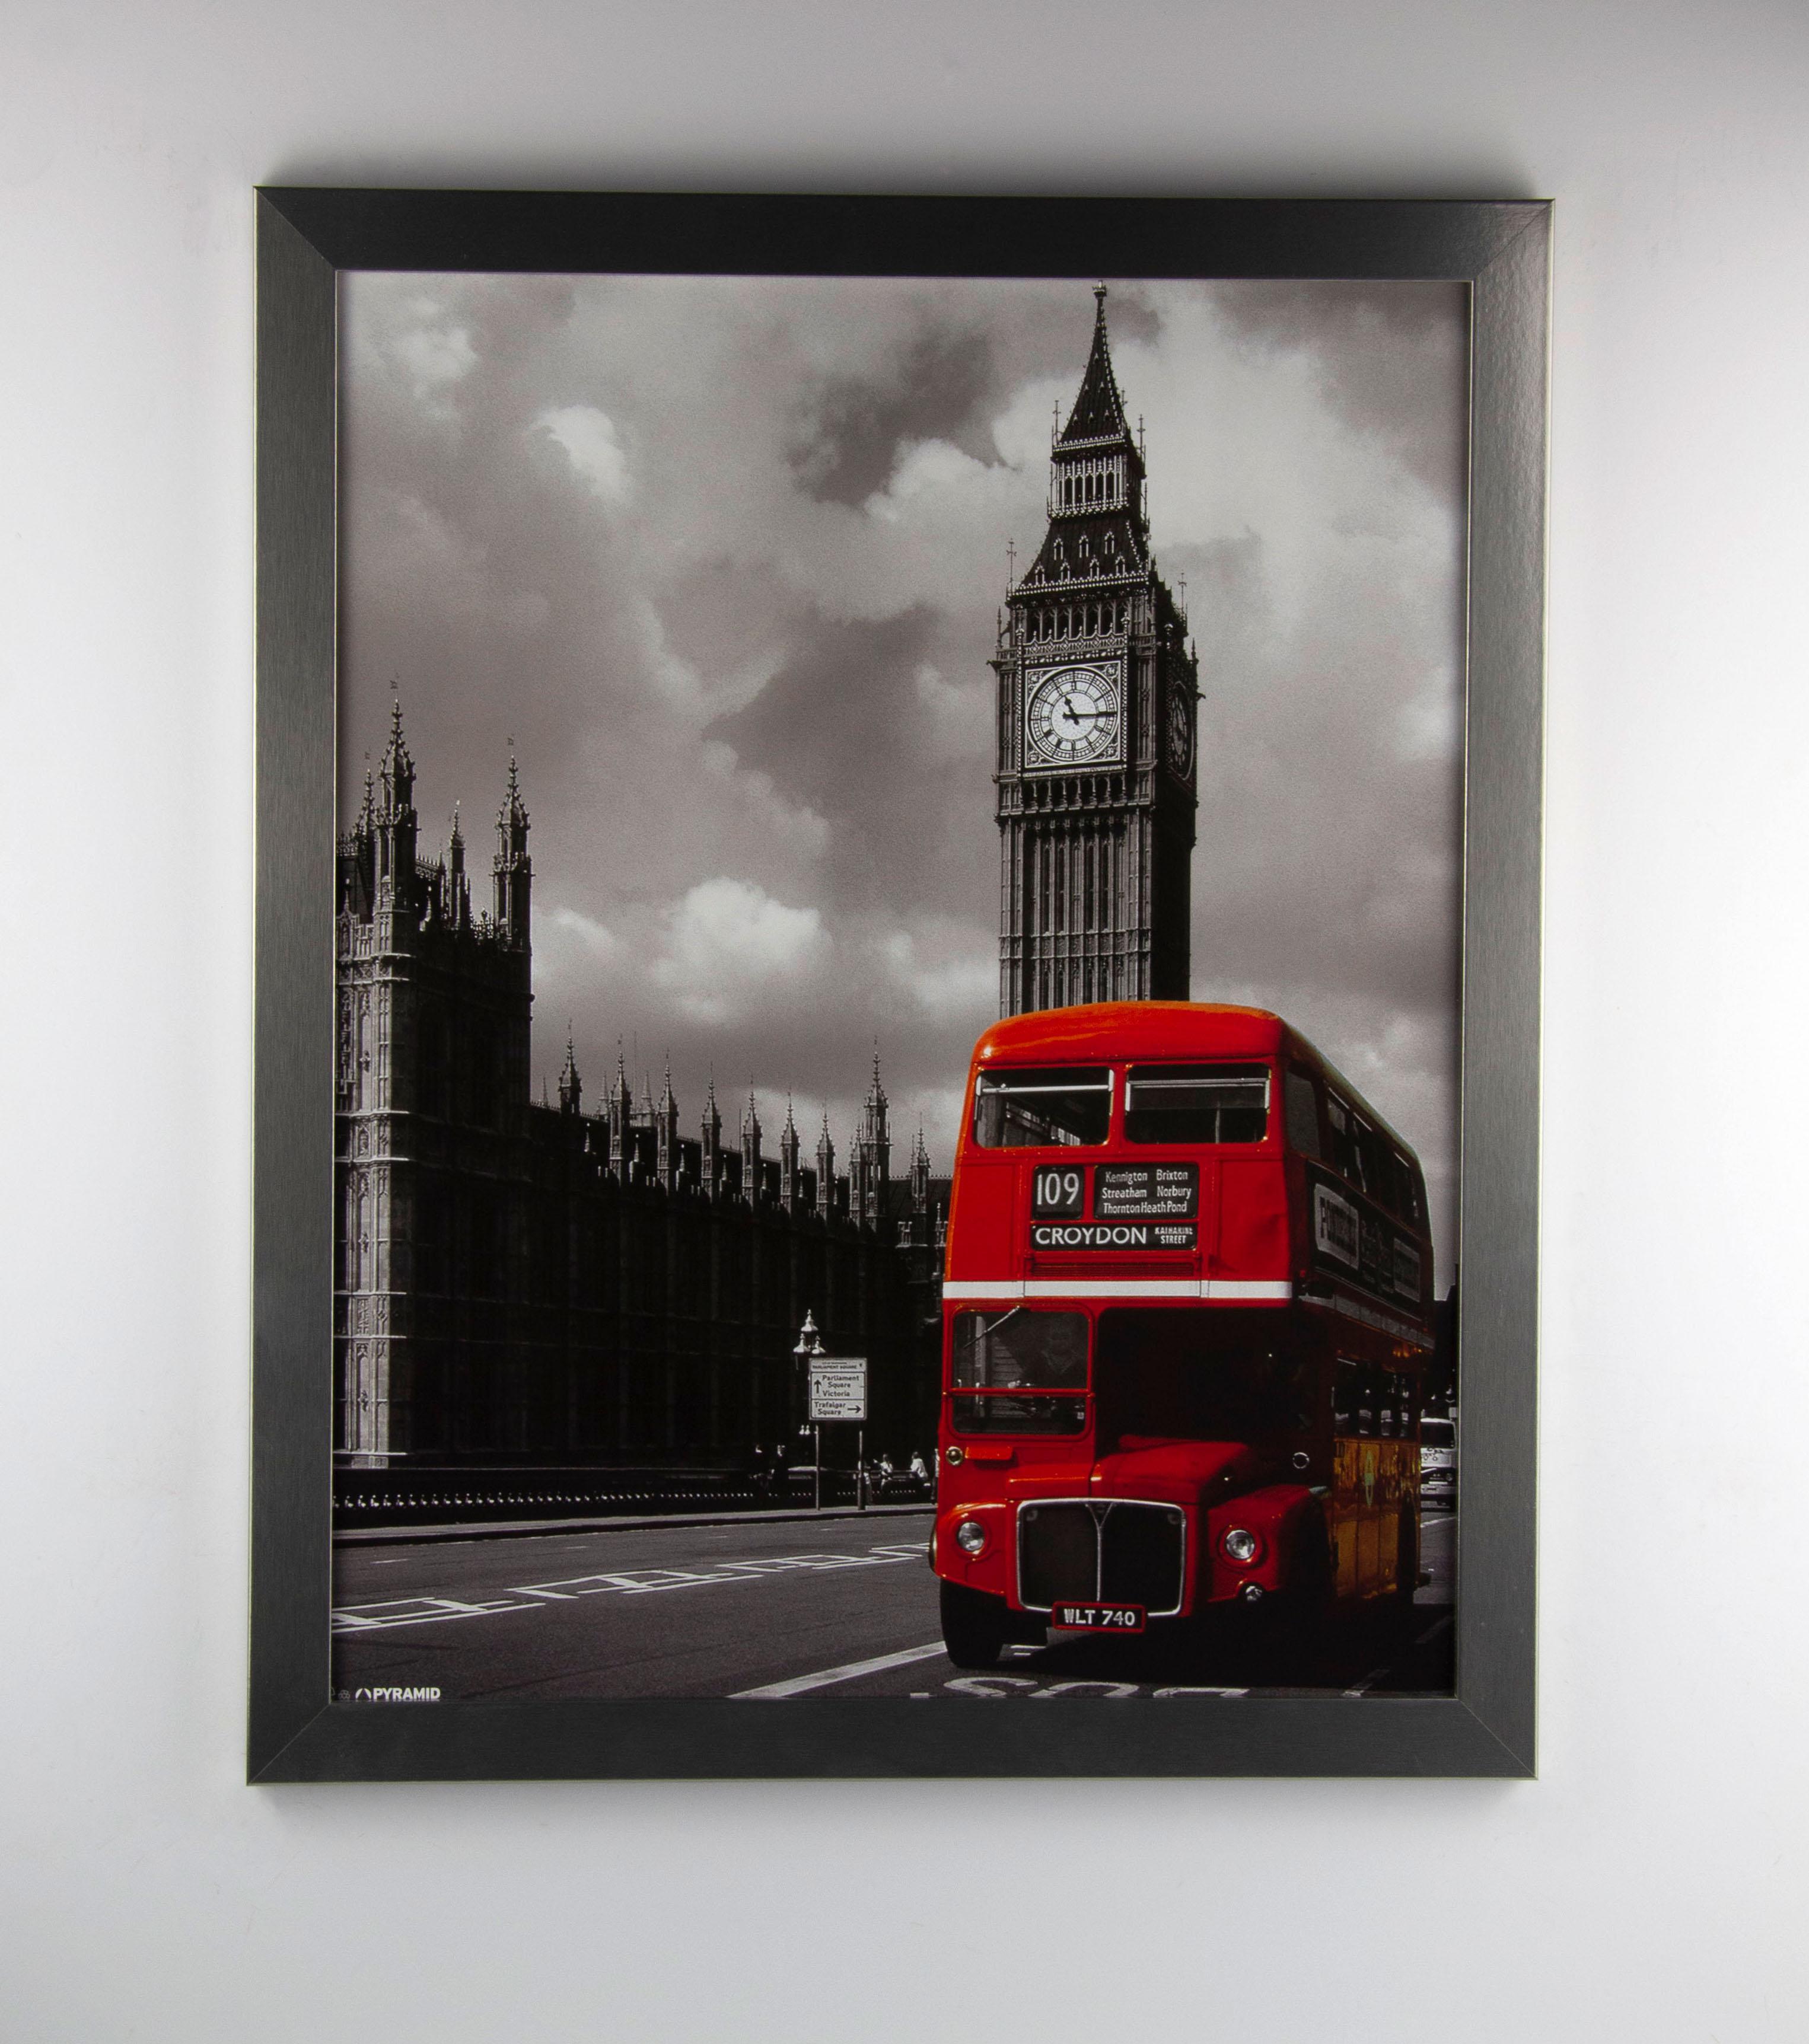 bilderrahmen kallisto wei holz mdf natur verschiedene gr en ebay. Black Bedroom Furniture Sets. Home Design Ideas